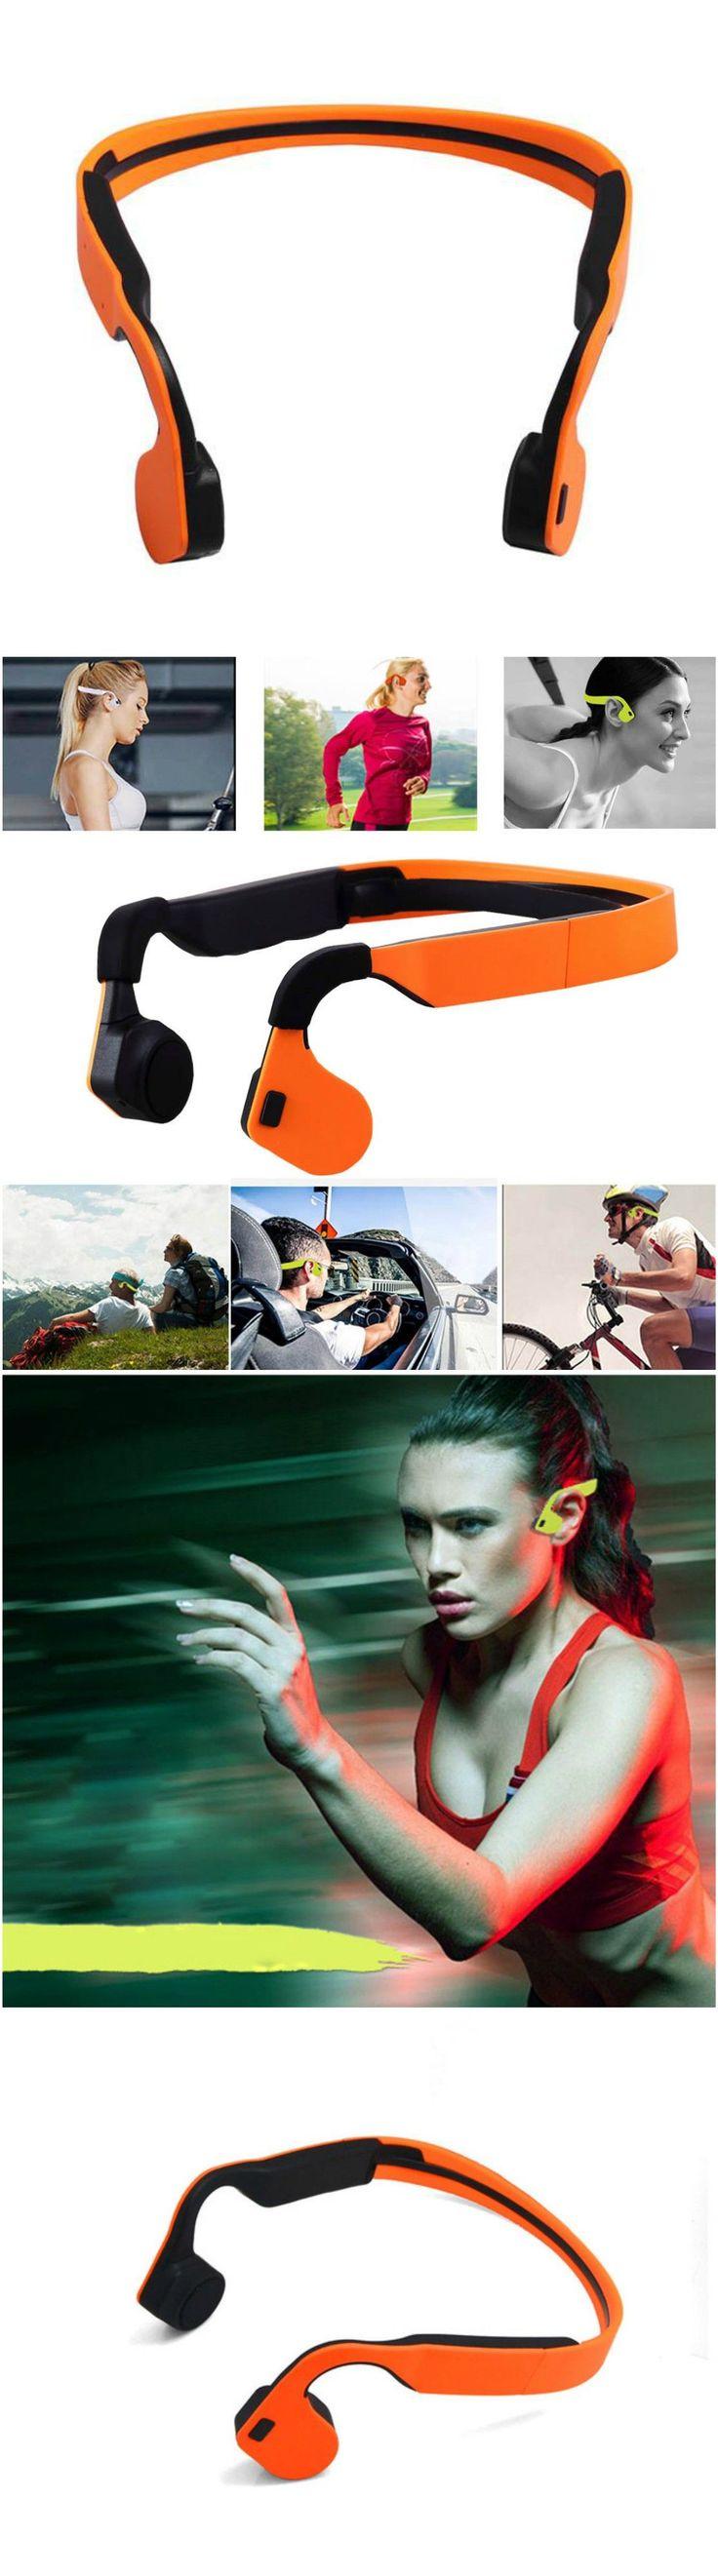 Bone Conduction Wireless Bluetooth Stereo Headset Bluetooth Neck-Strap Hands-Free Earphone, tech, technology, tech gadgets, tech gifts, tech gifts for men, #tech, #technology, #techgadgets, #techgifts, #techgiftsformen  www.thinkruptor.com